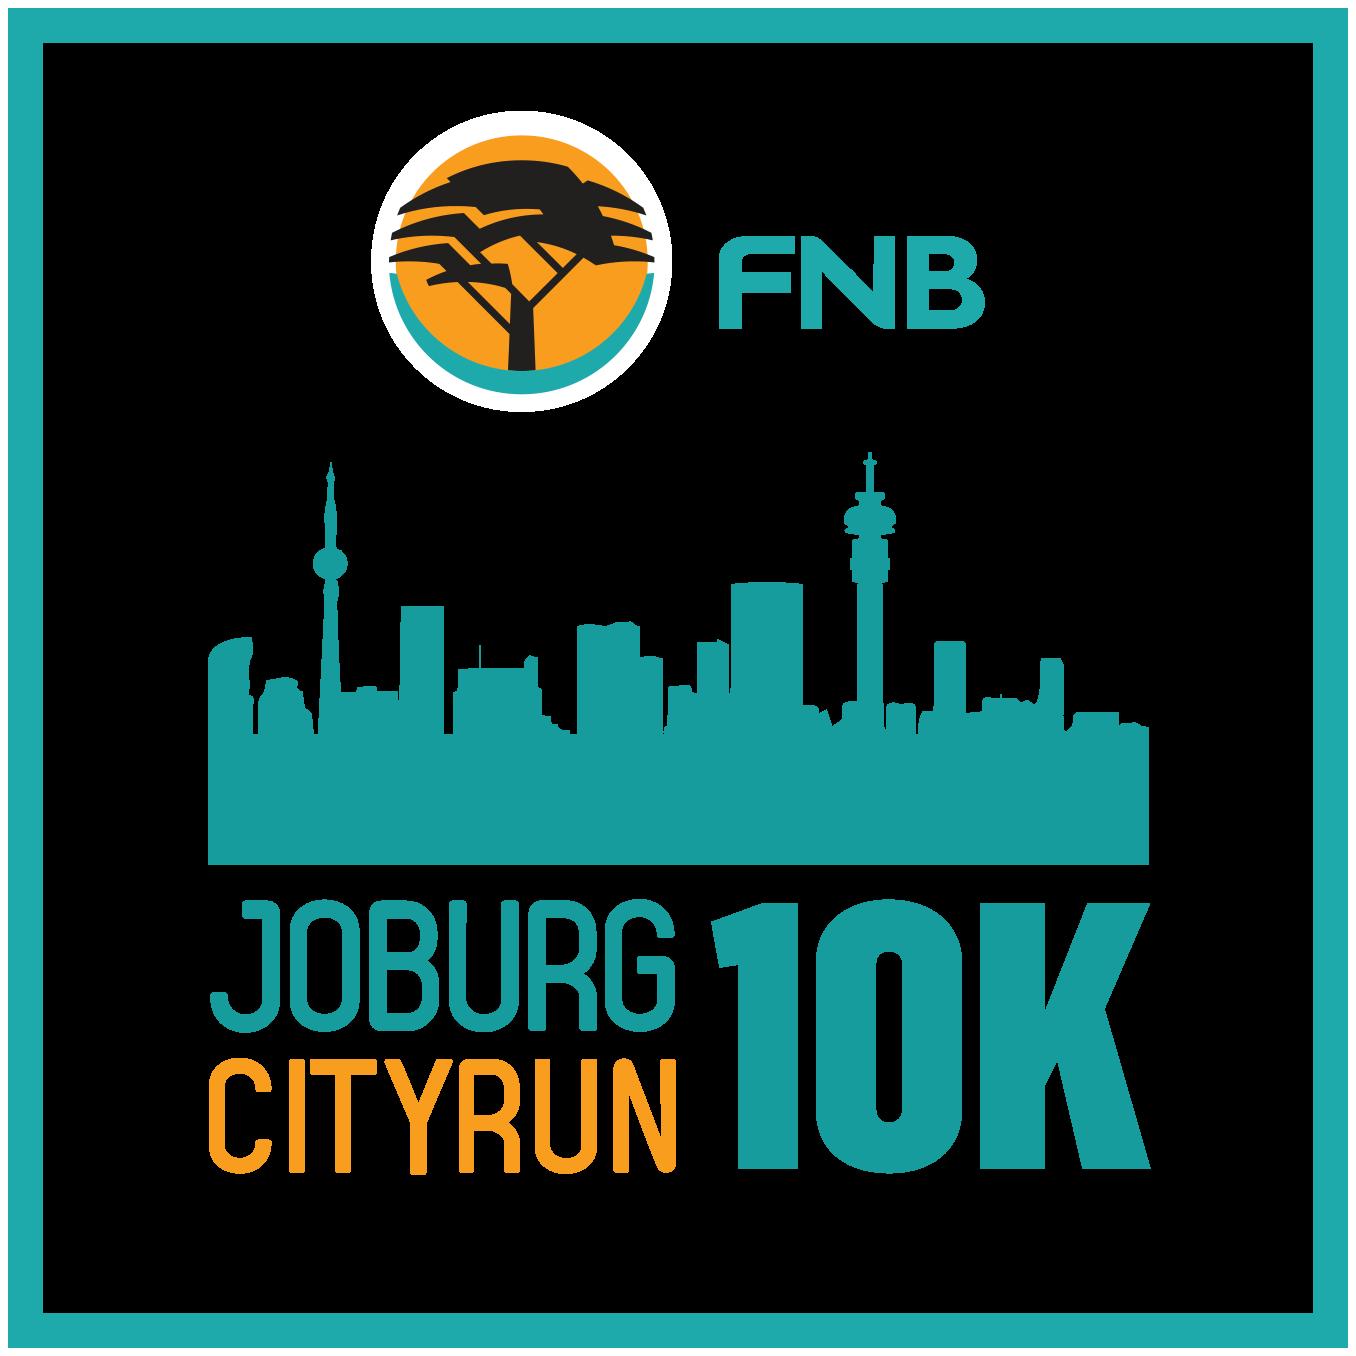 FNB Joburg 10K CITYRUN